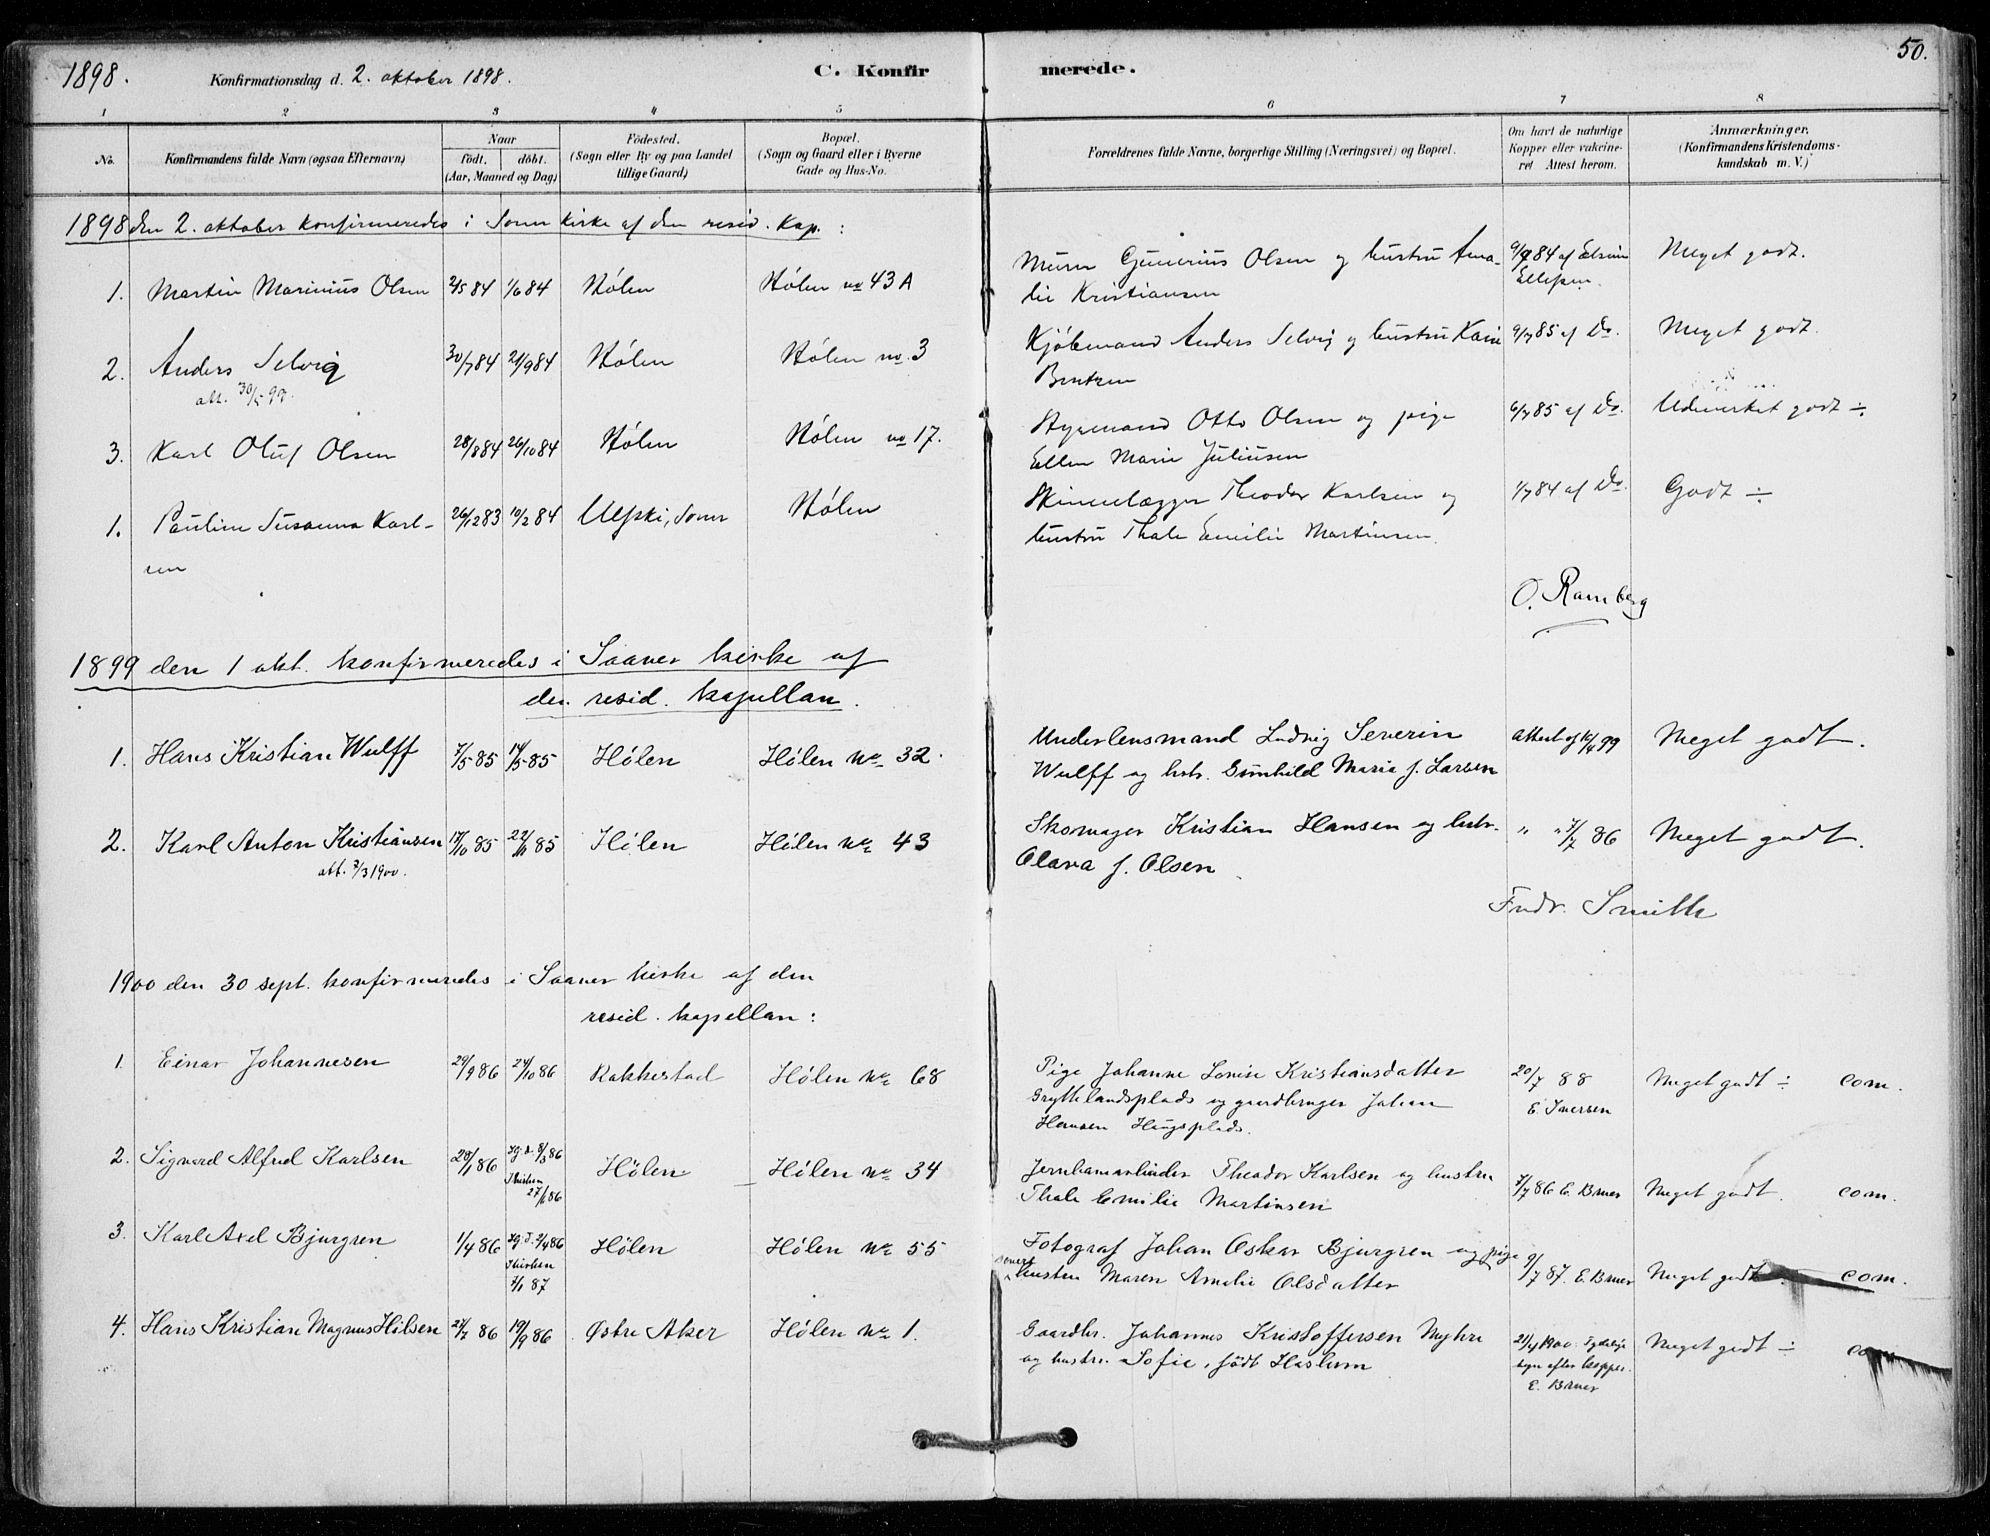 SAO, Vestby prestekontor Kirkebøker, F/Fe/L0001: Ministerialbok nr. V 1, 1878-1931, s. 50